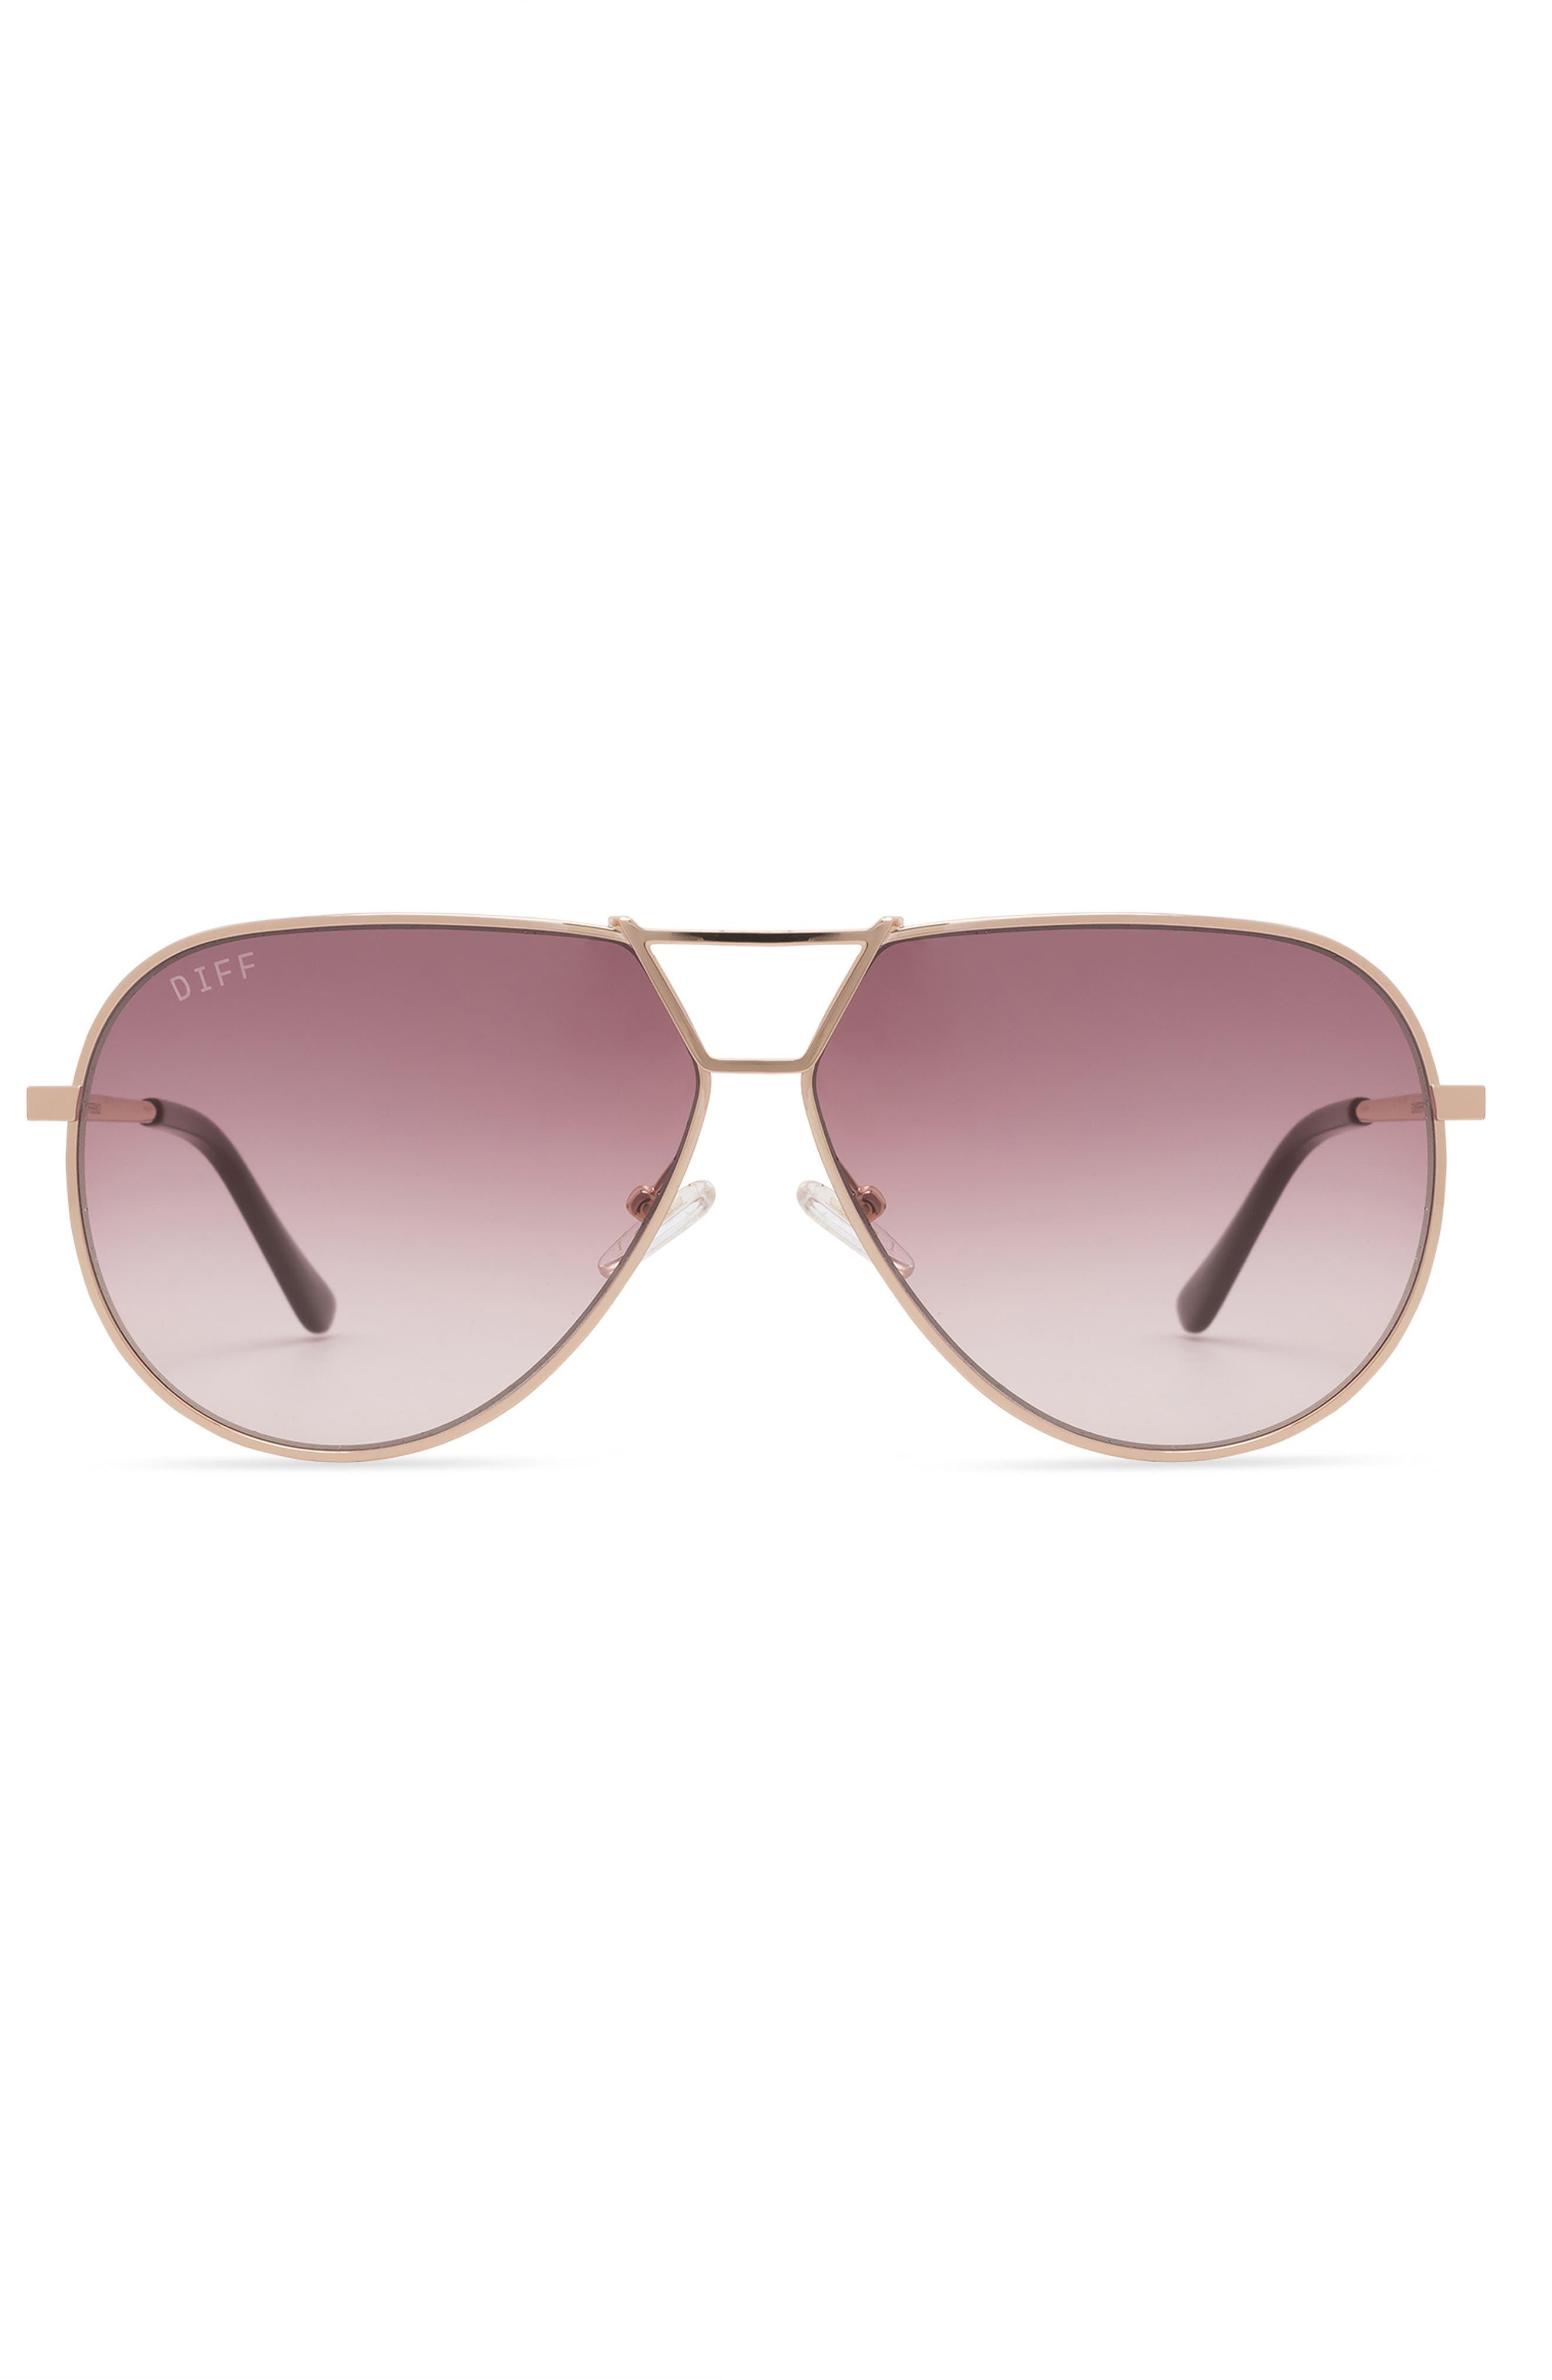 Devon 65mm Oversize Gradient Aviator Sunglasses